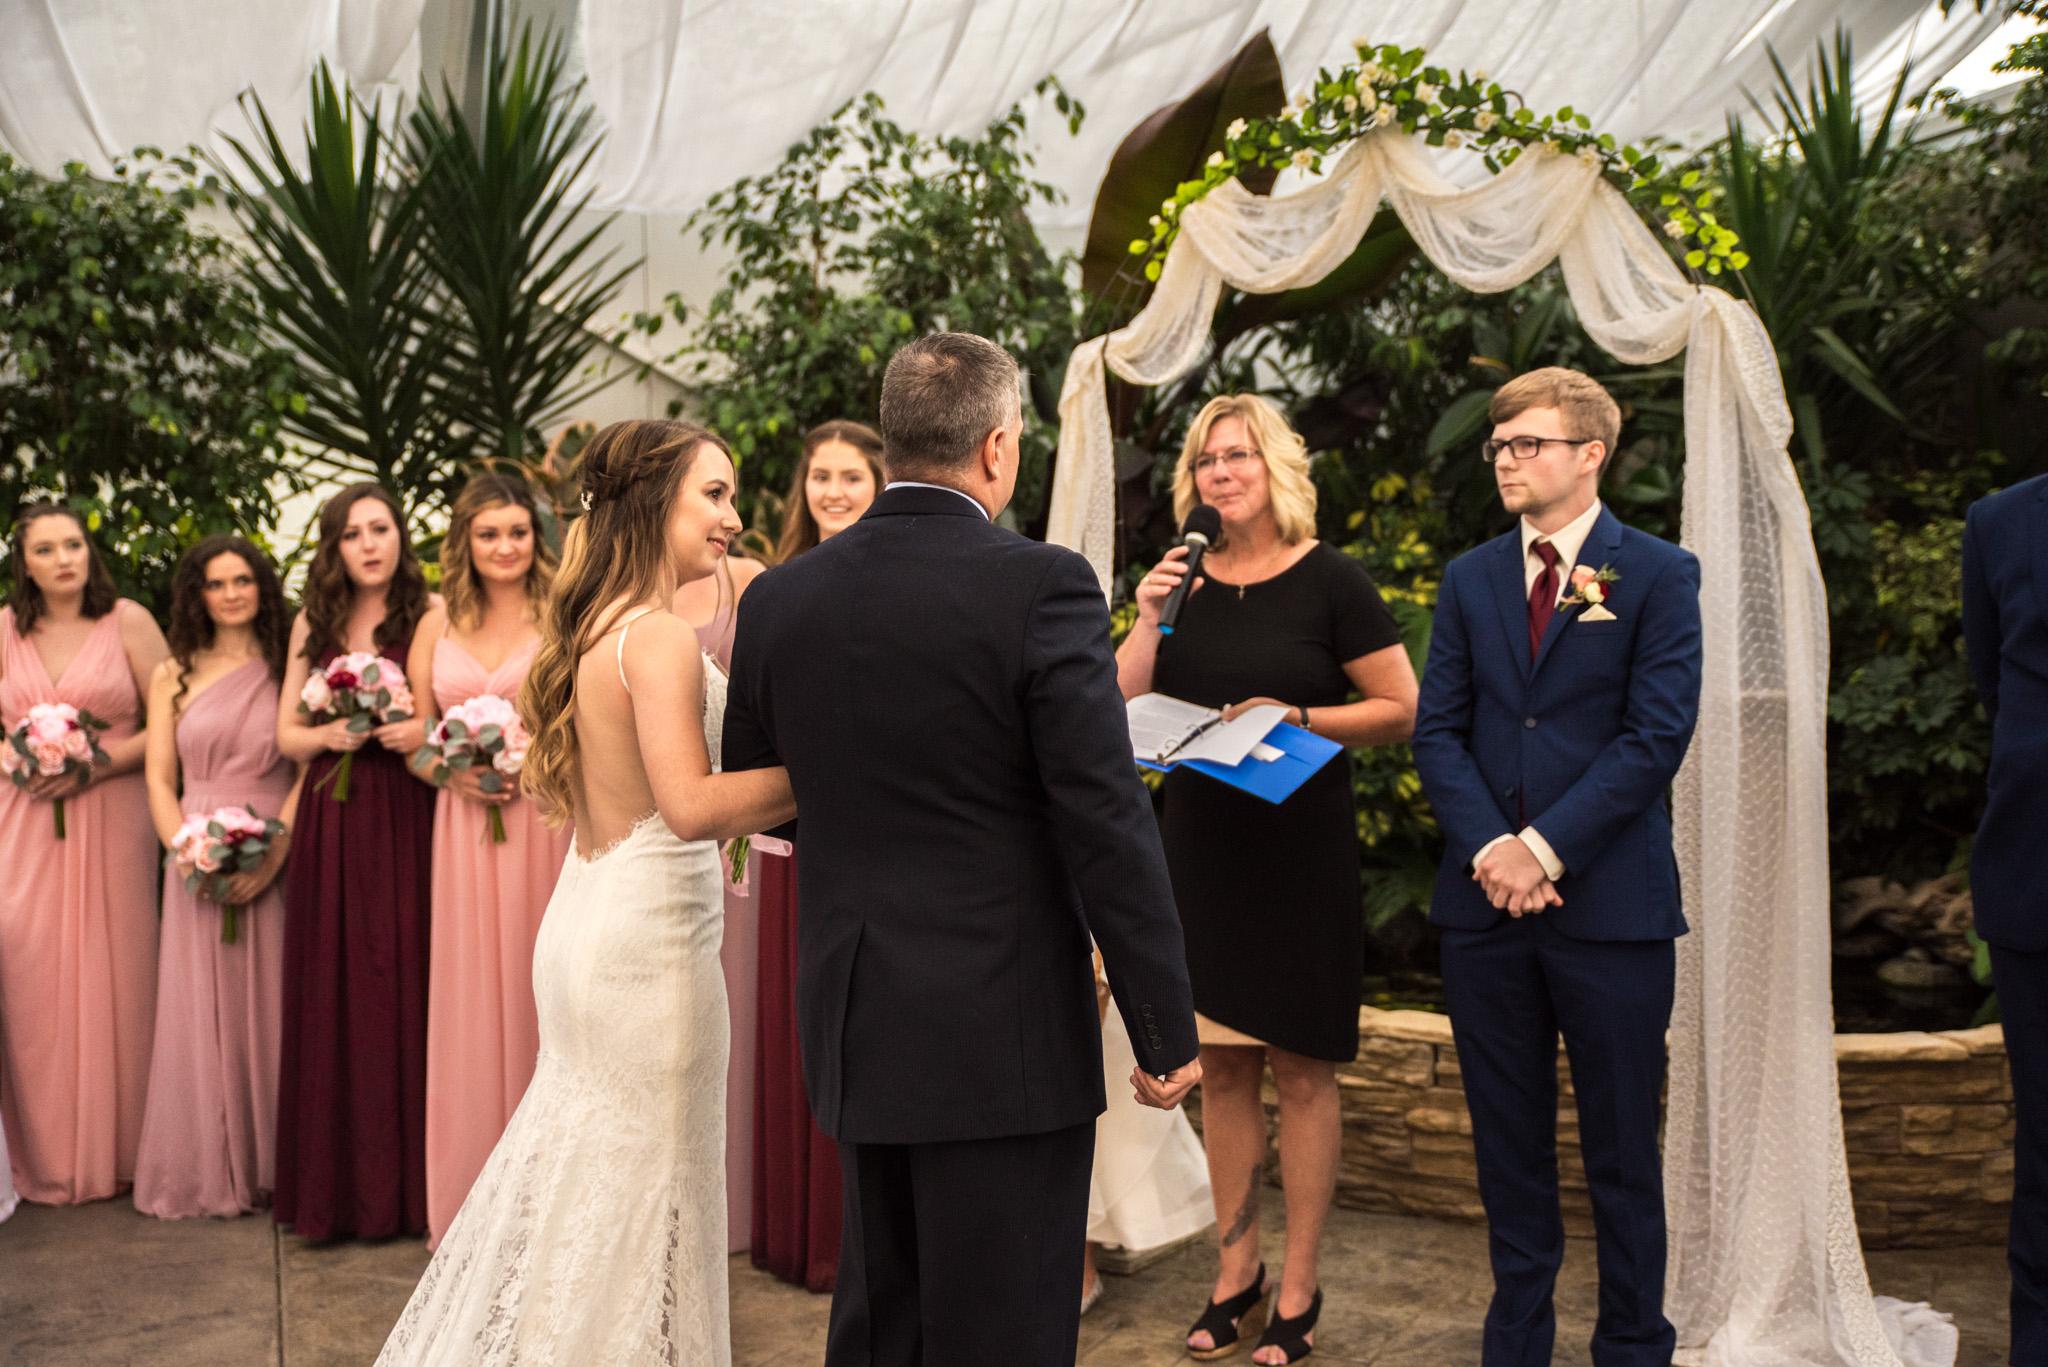 Abbotsford Wedding Photographer-31.jpg